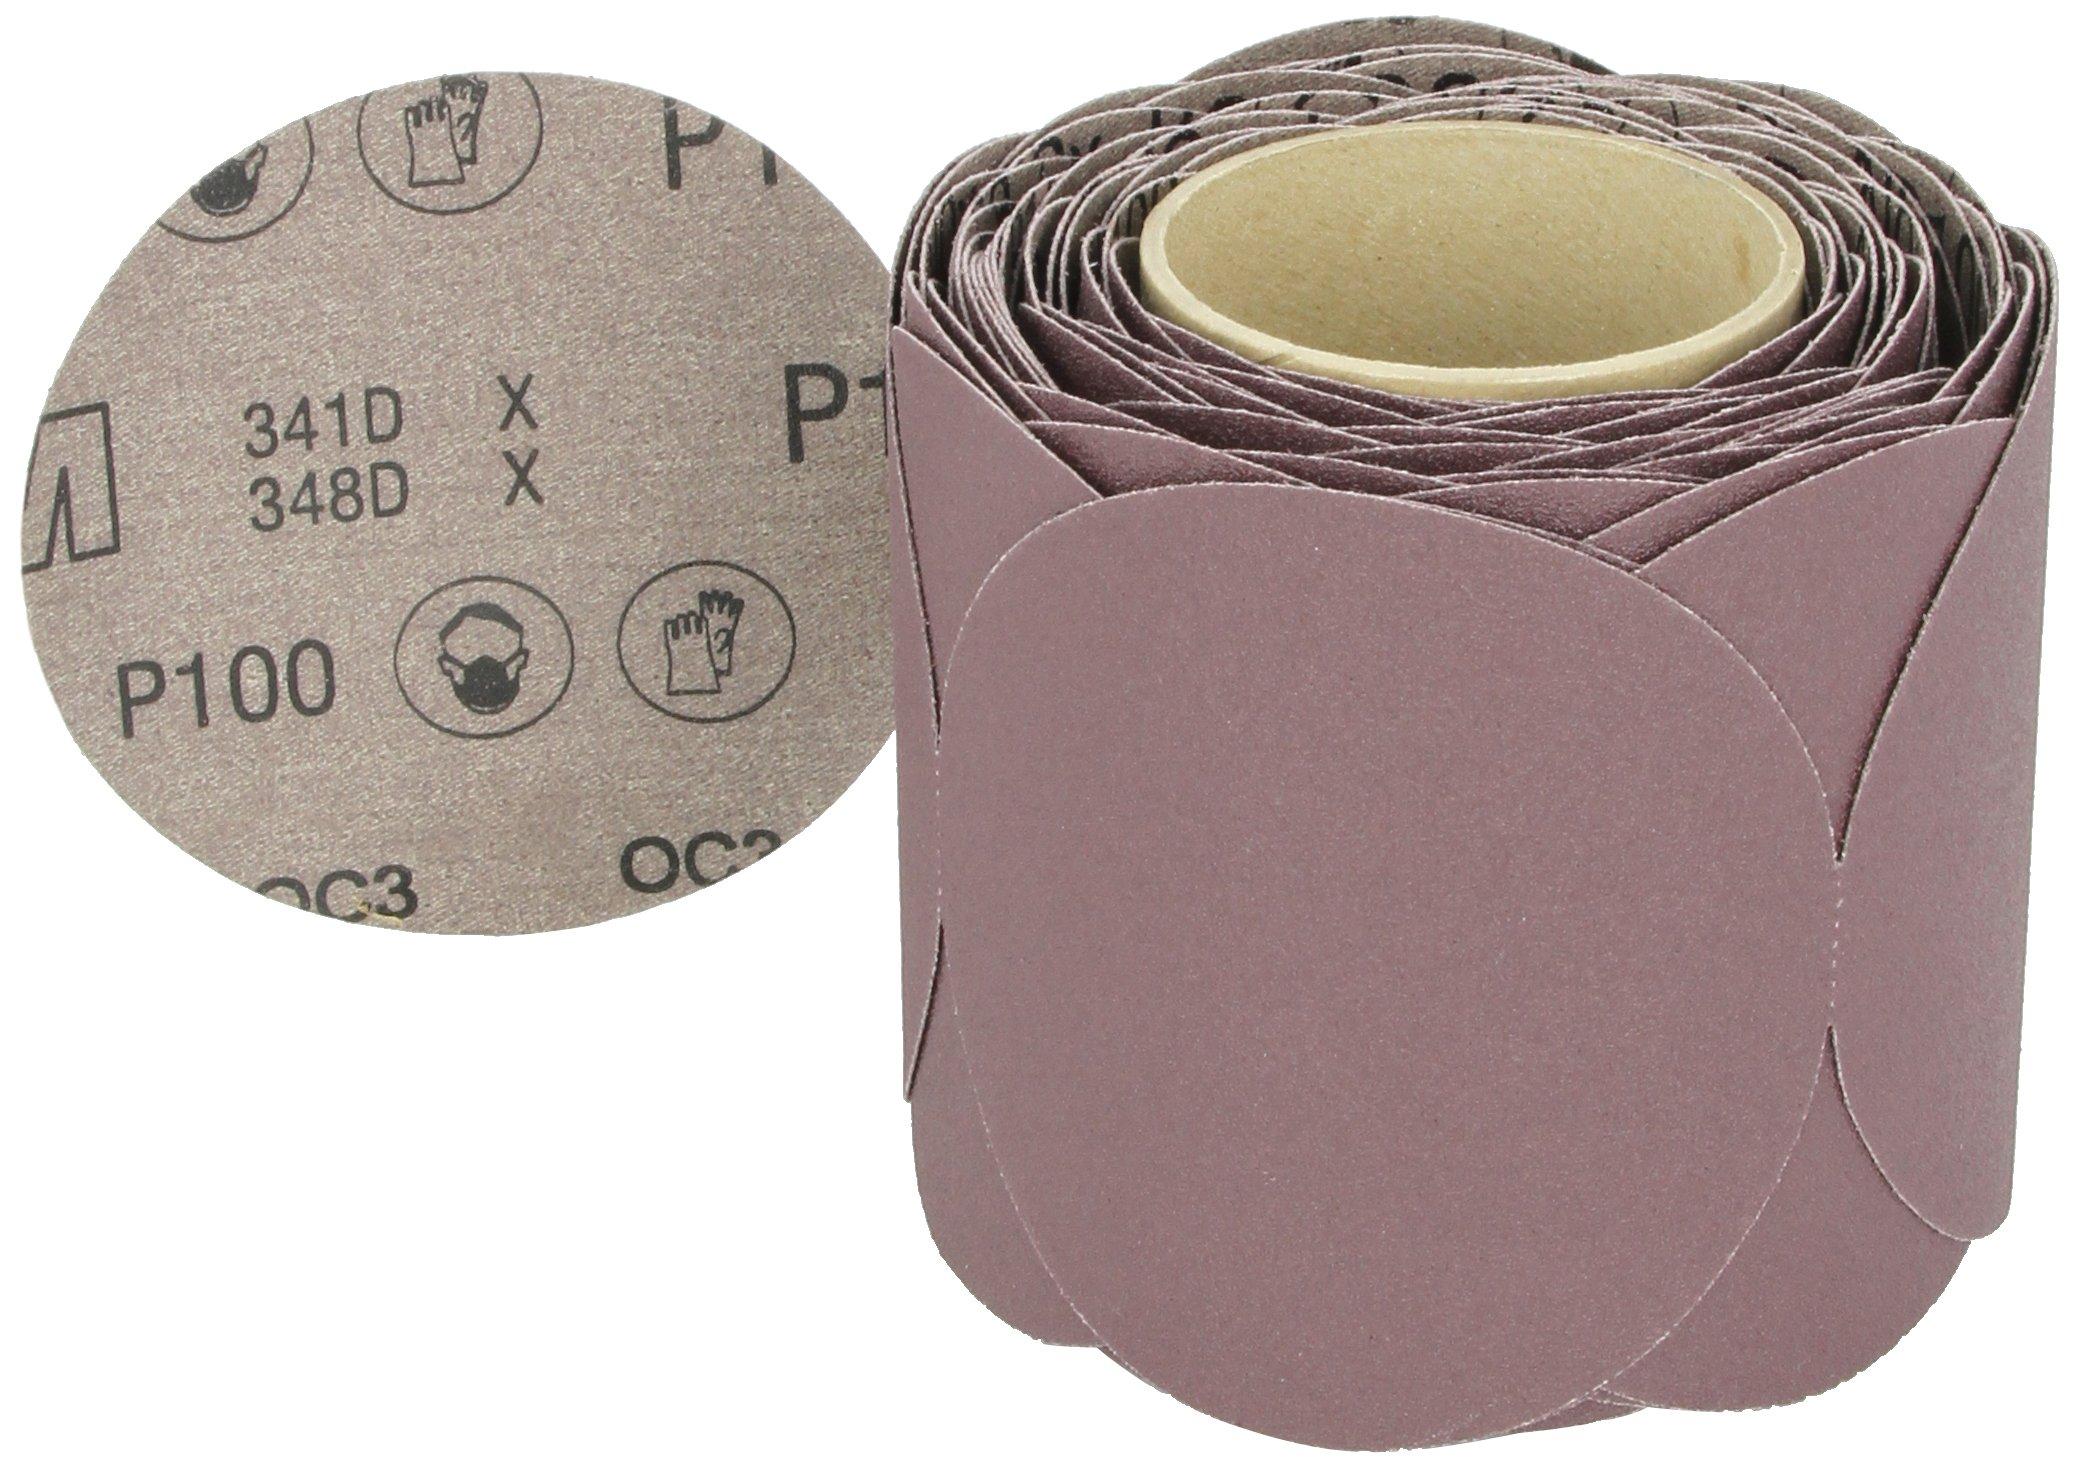 3M Stikit Cloth Disc Roll 341D, PSA Attachment, Aluminum Oxide, 5'' Diameter, P100 Grit (Roll of 100)